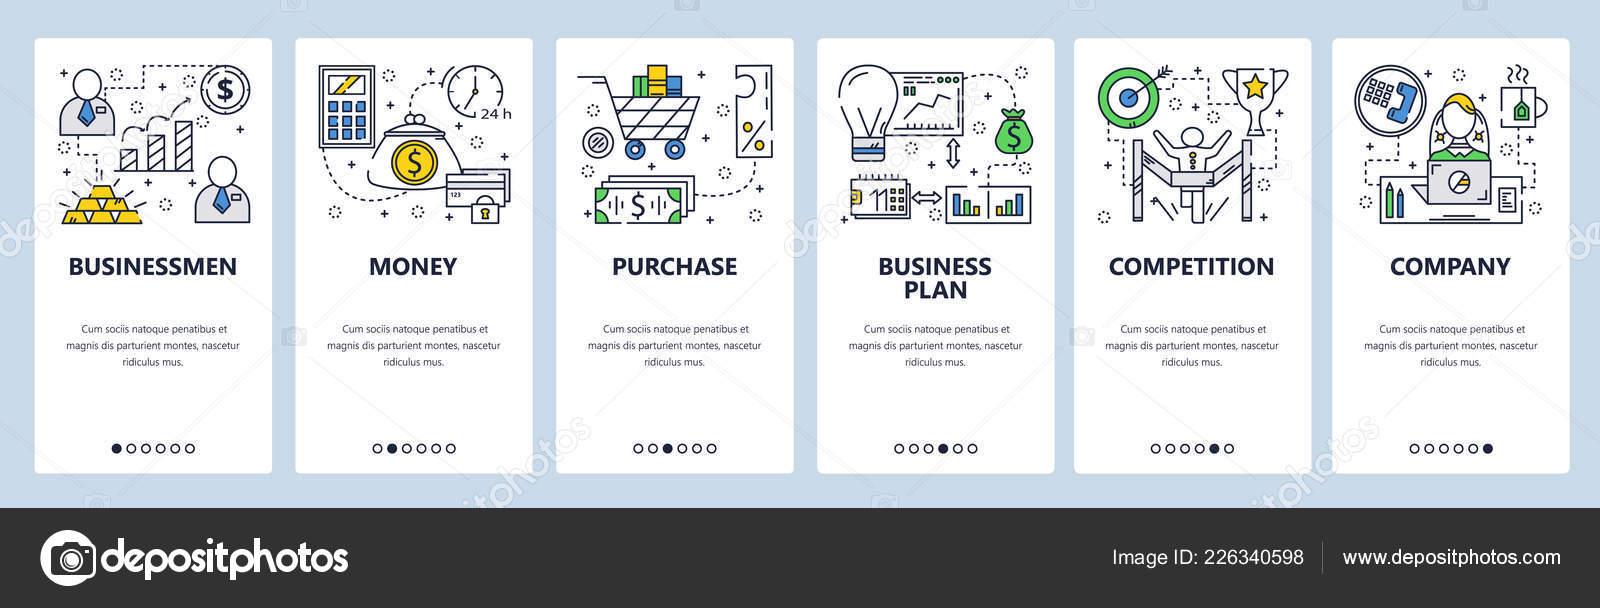 music app business plan